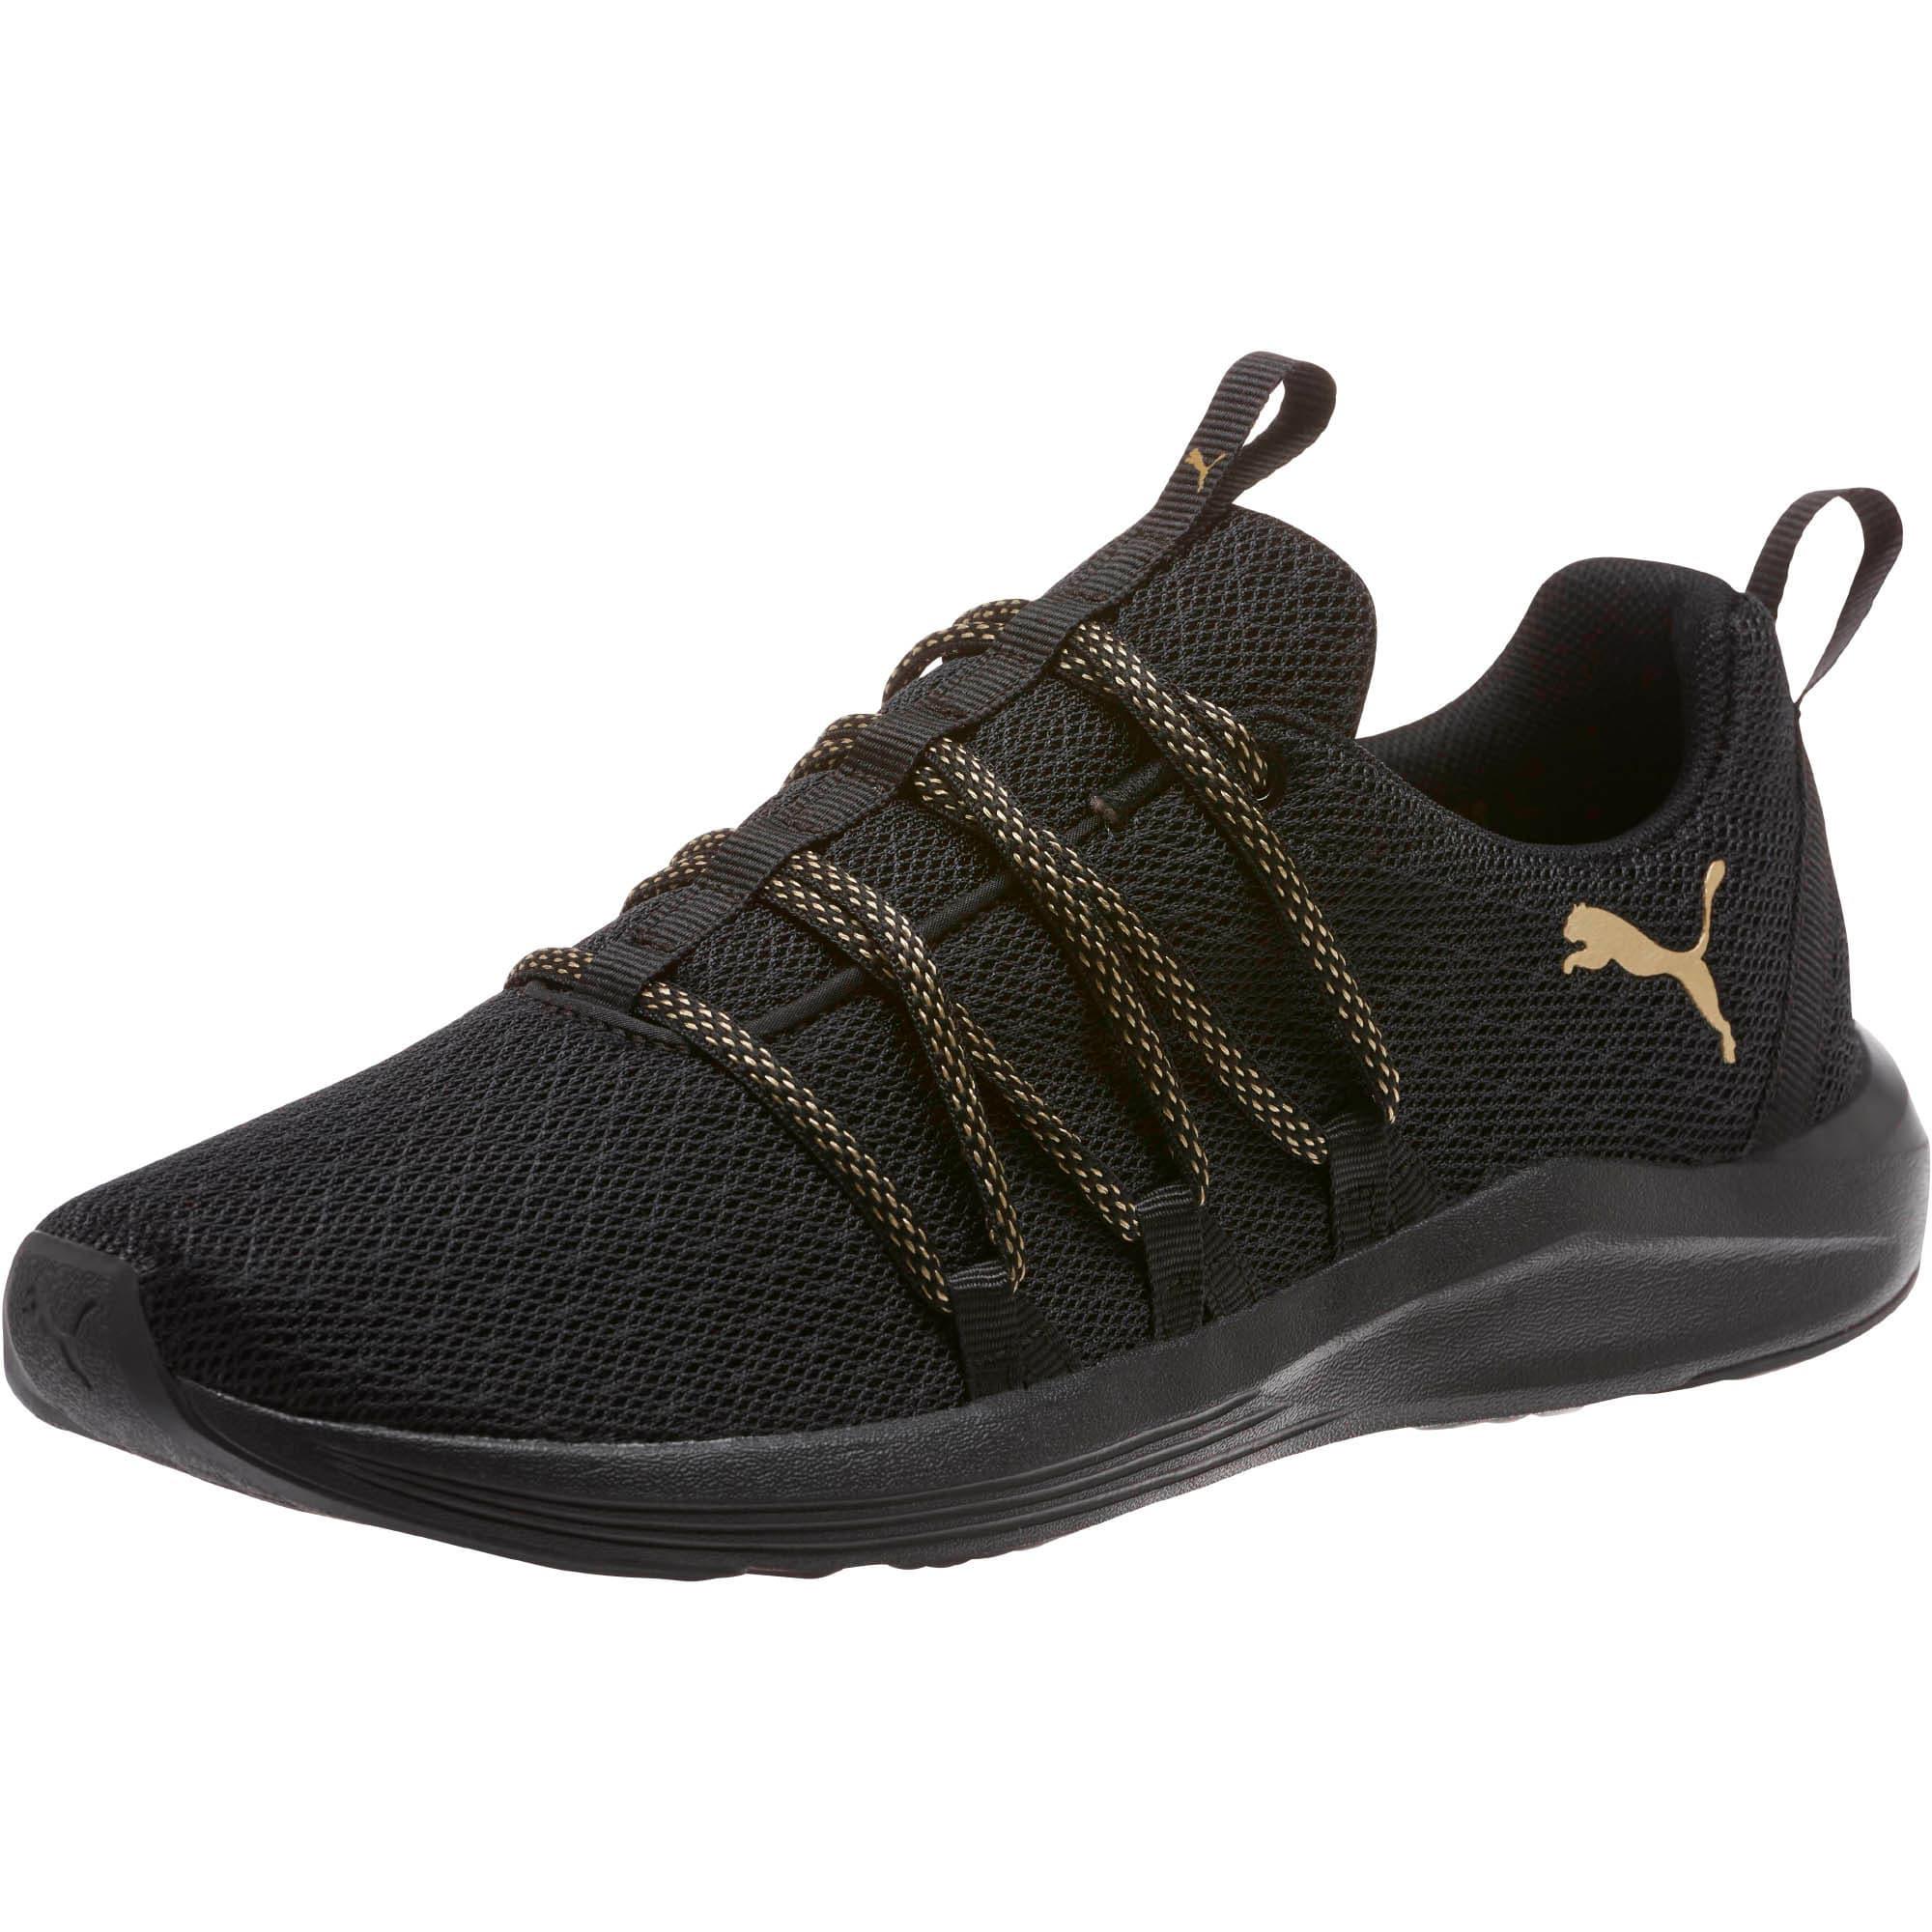 Thumbnail 1 of Prowl Alt Knit Mesh Women's Running Shoes, Puma Black-Metallic Gold, medium